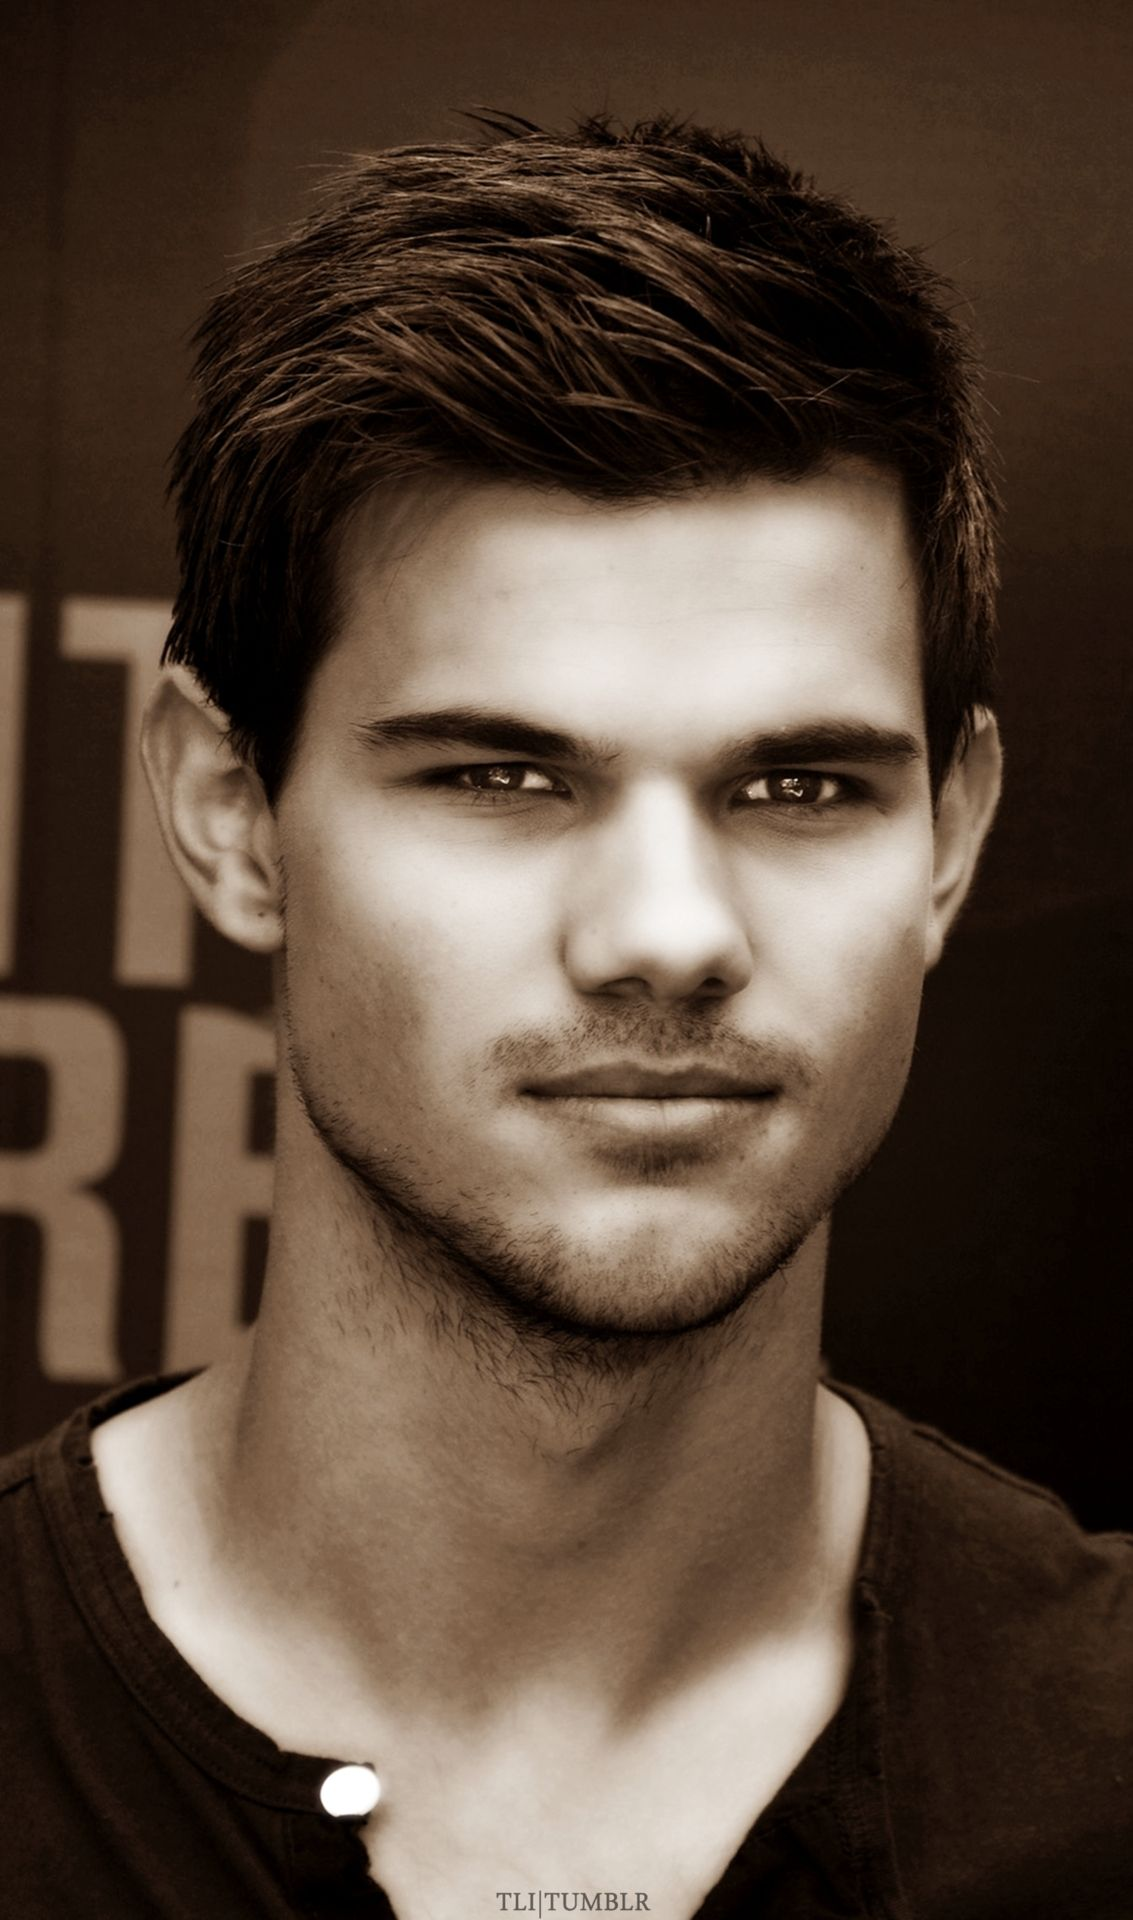 Taylor Lautner | Taylor Lautner | Taylor lautner, Taylor ...